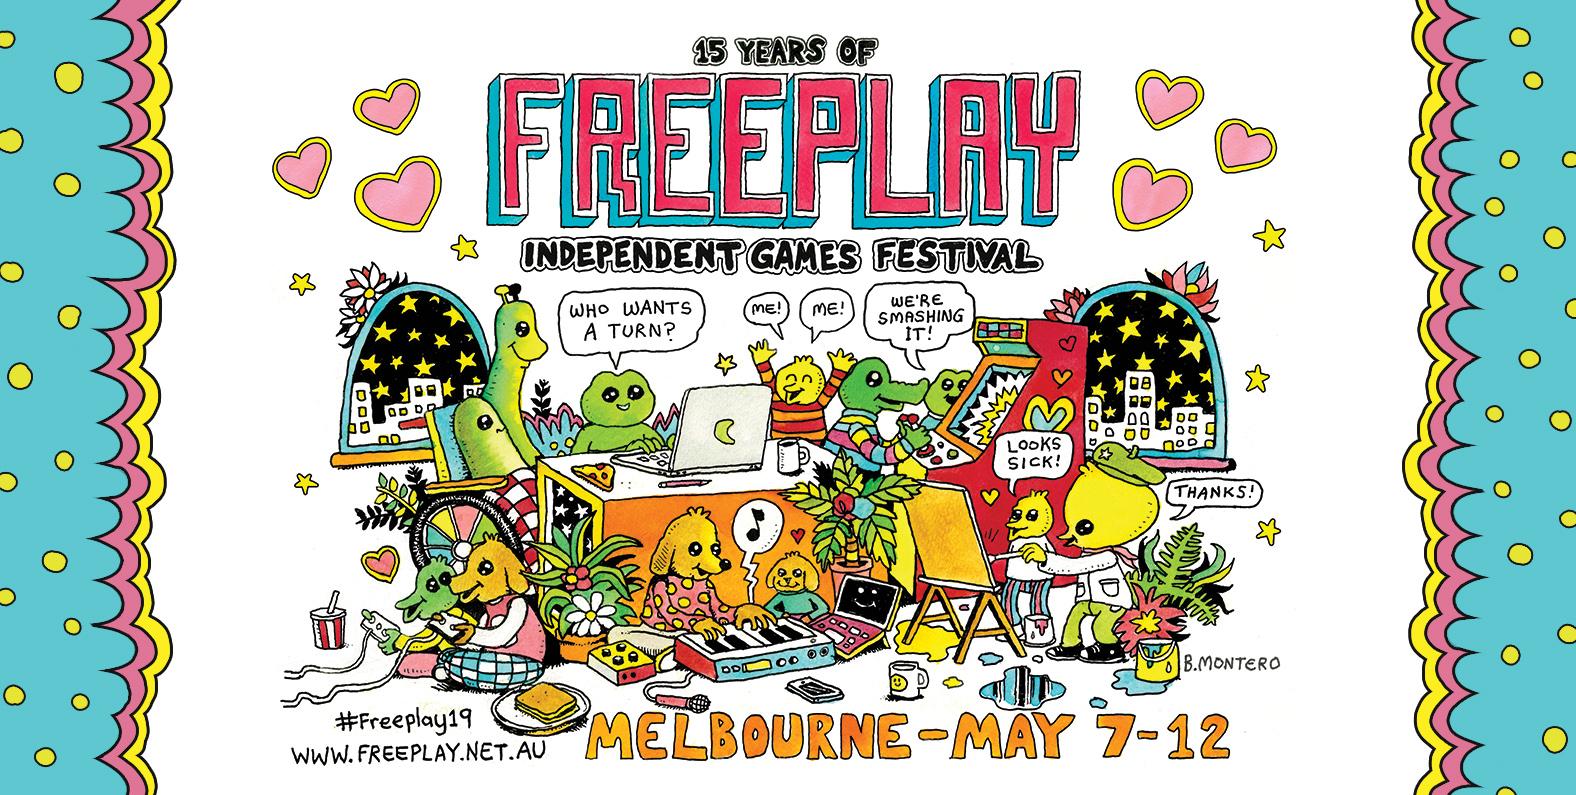 Freeplay Awards 2019 | Freeplay